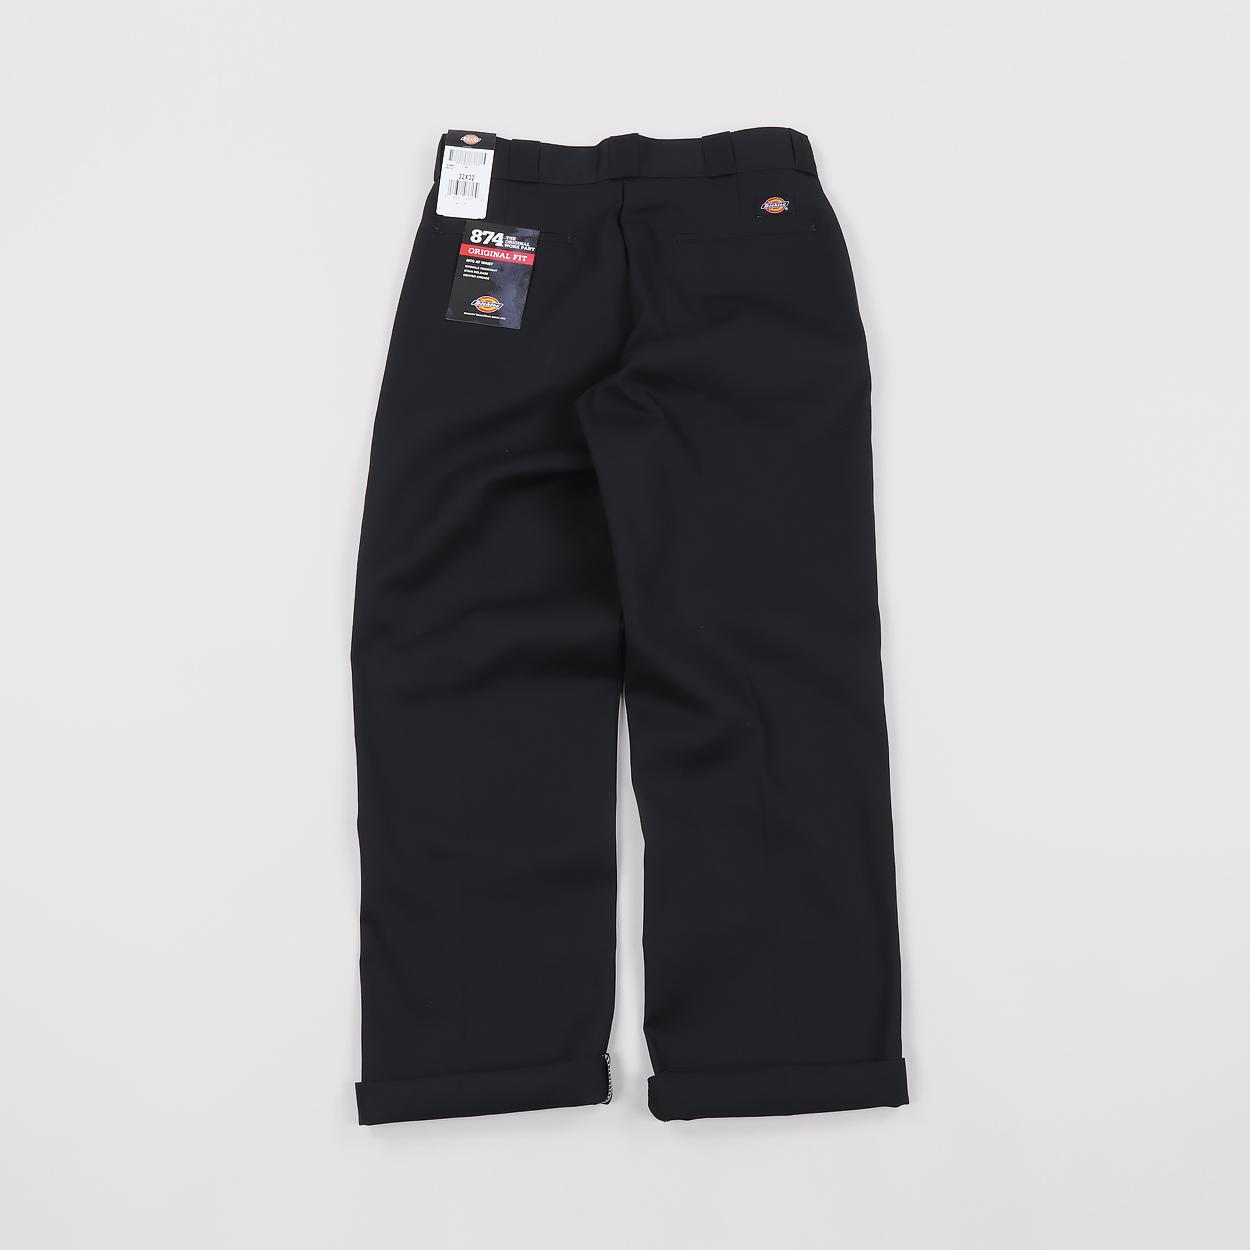 88ecb2af2ce8b2 Dickies Workwear Trousers Mens Original 874 Work Pant Black £45.00